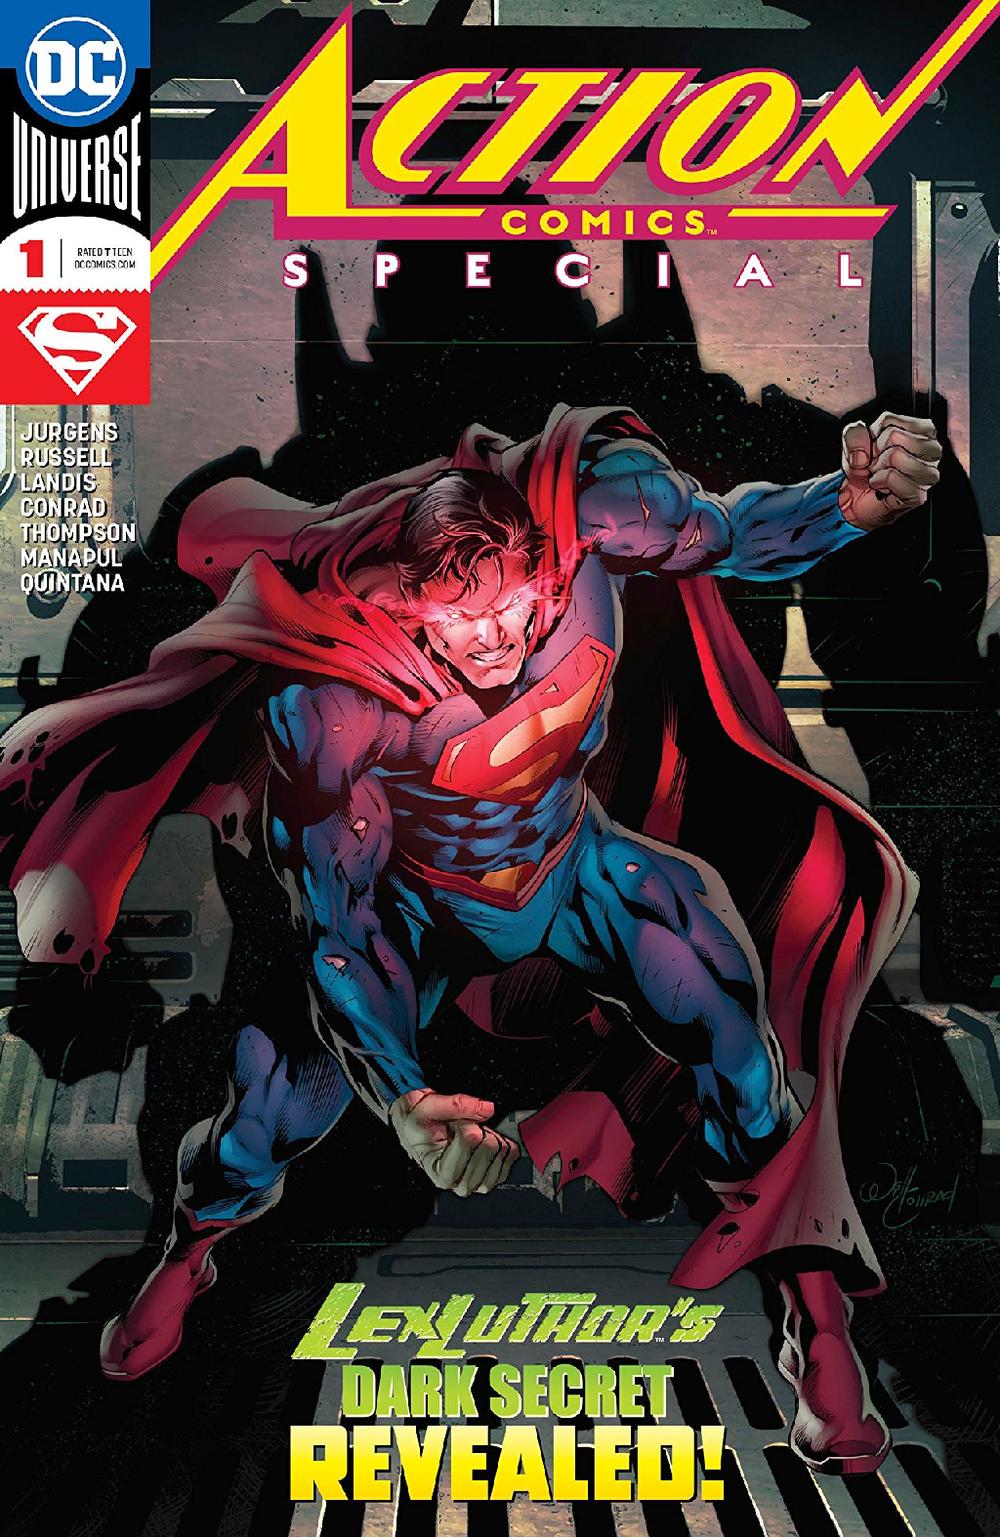 Action_Comics_Special-#1.png